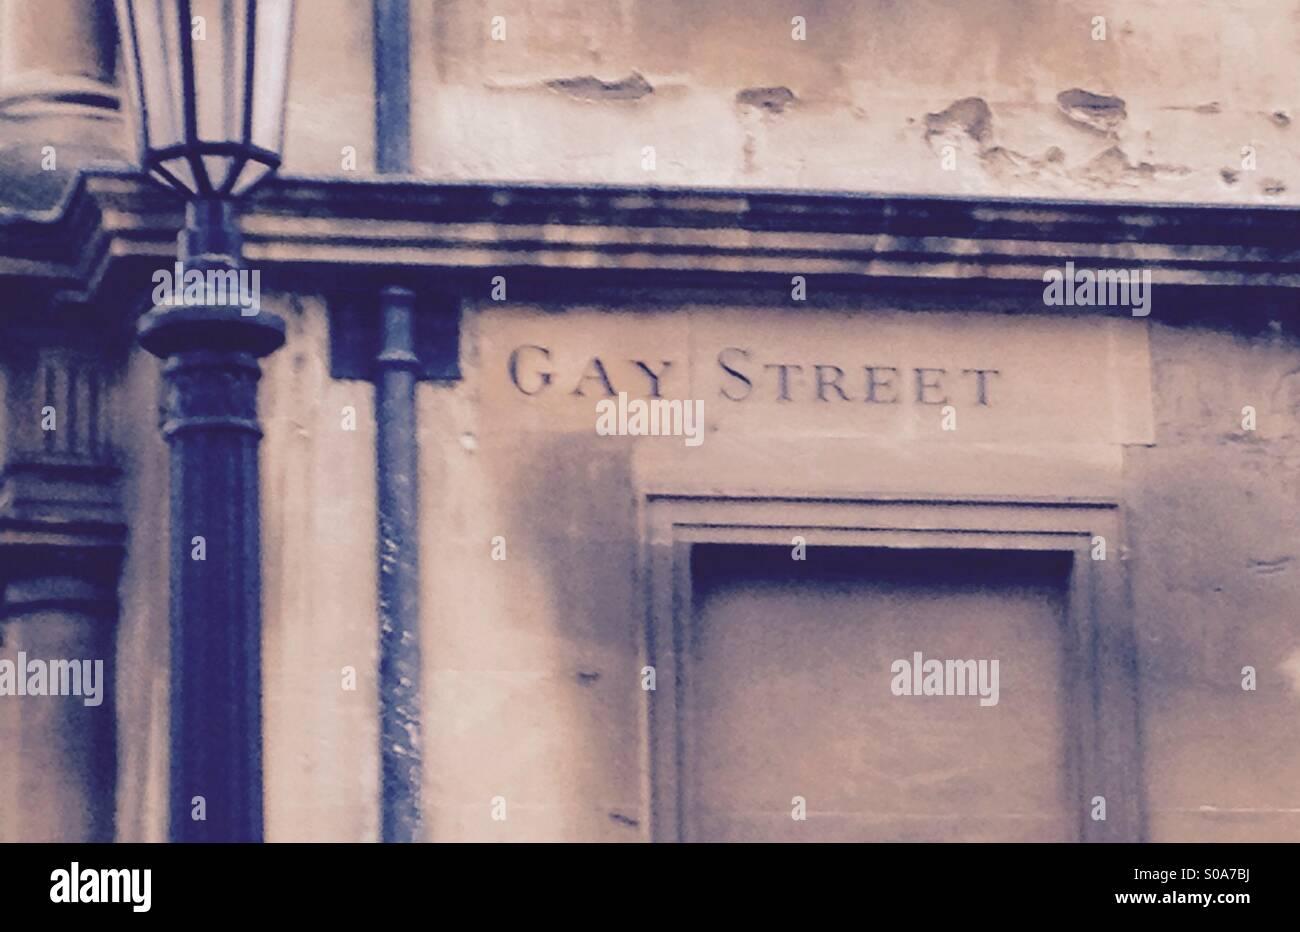 Gay Street - Stock Image